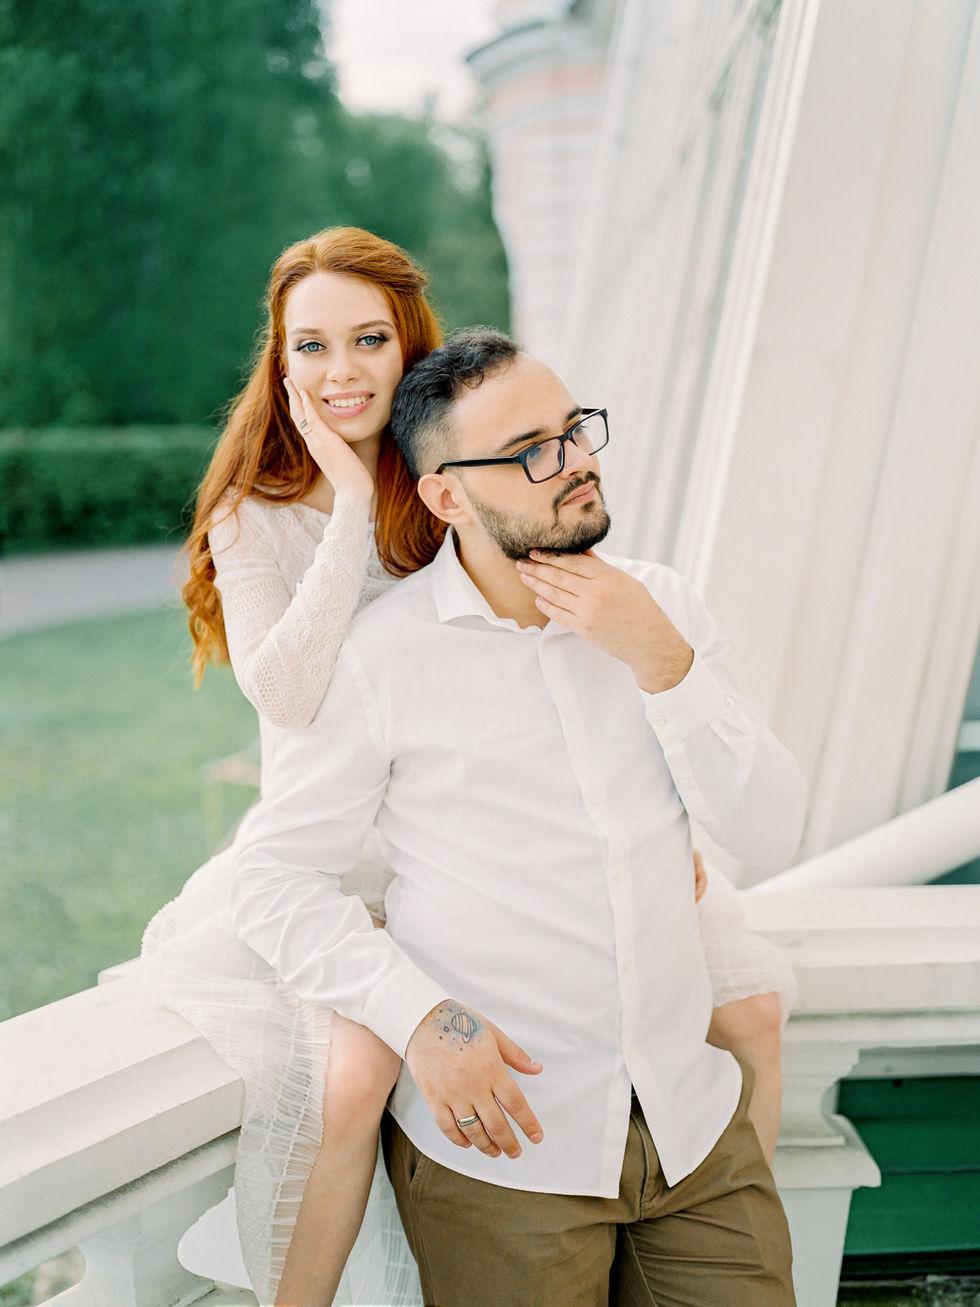 2019.05.10 Irina & Bogdan Kuskovo-11.jpg